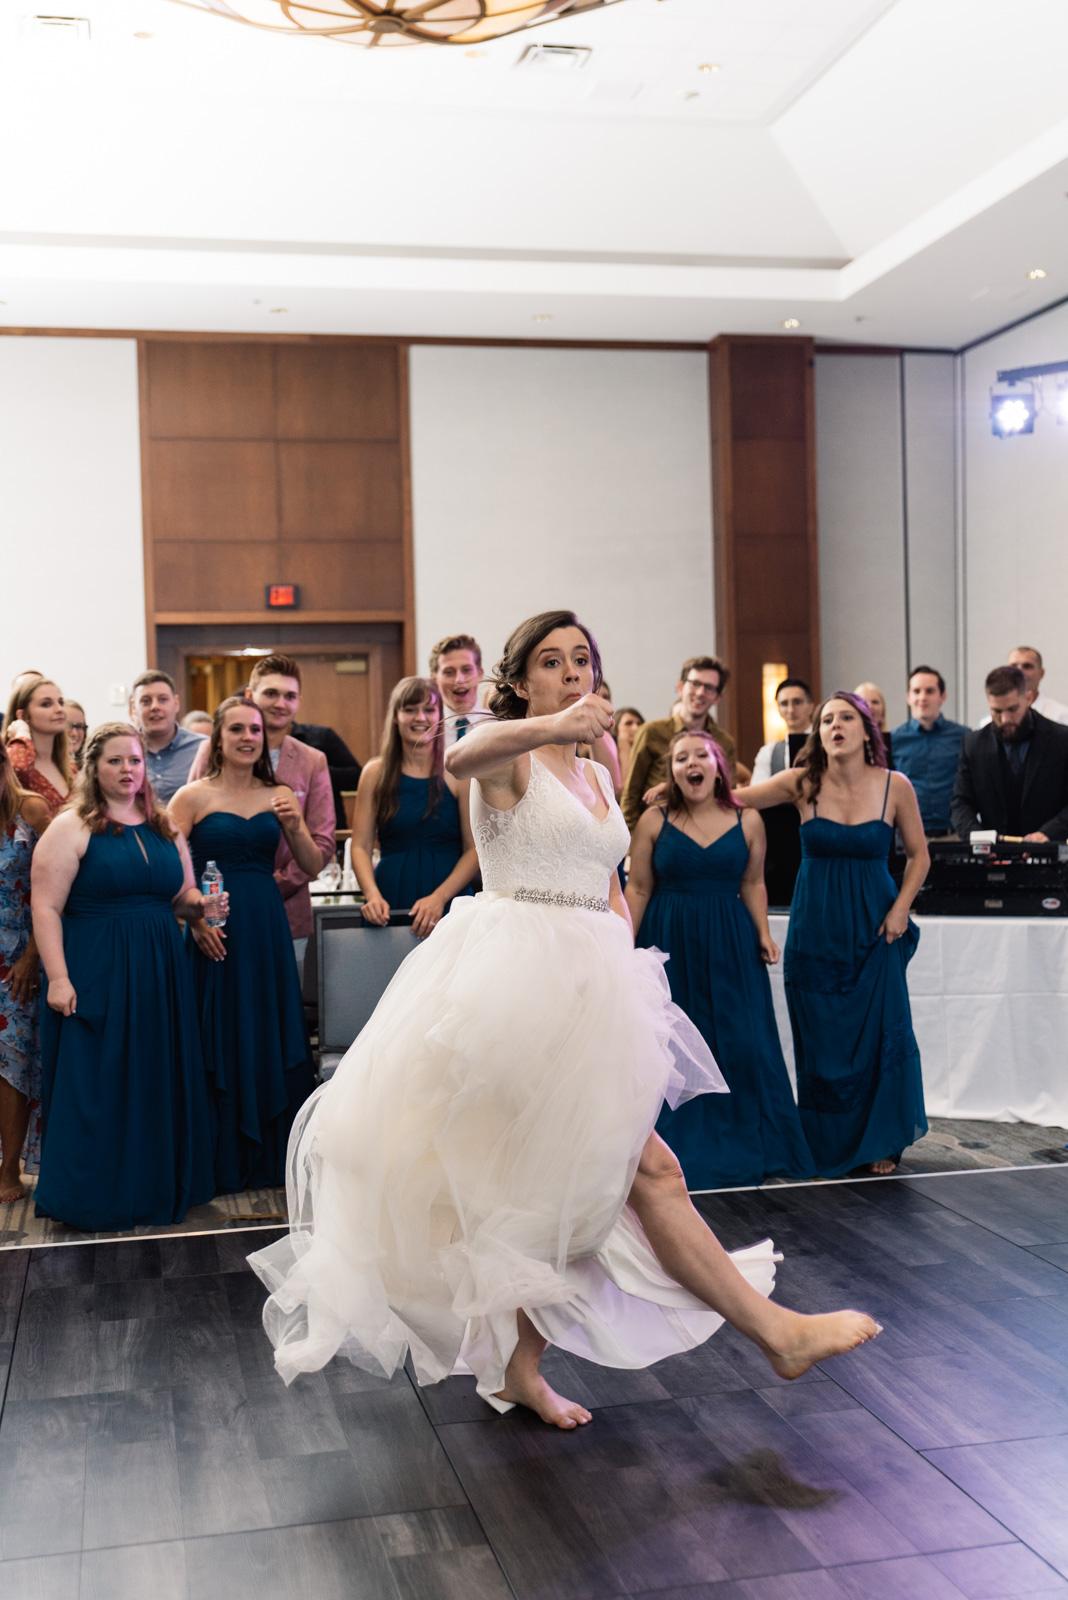 bride in epic dance battle Coralville Marriott Hotel wedding